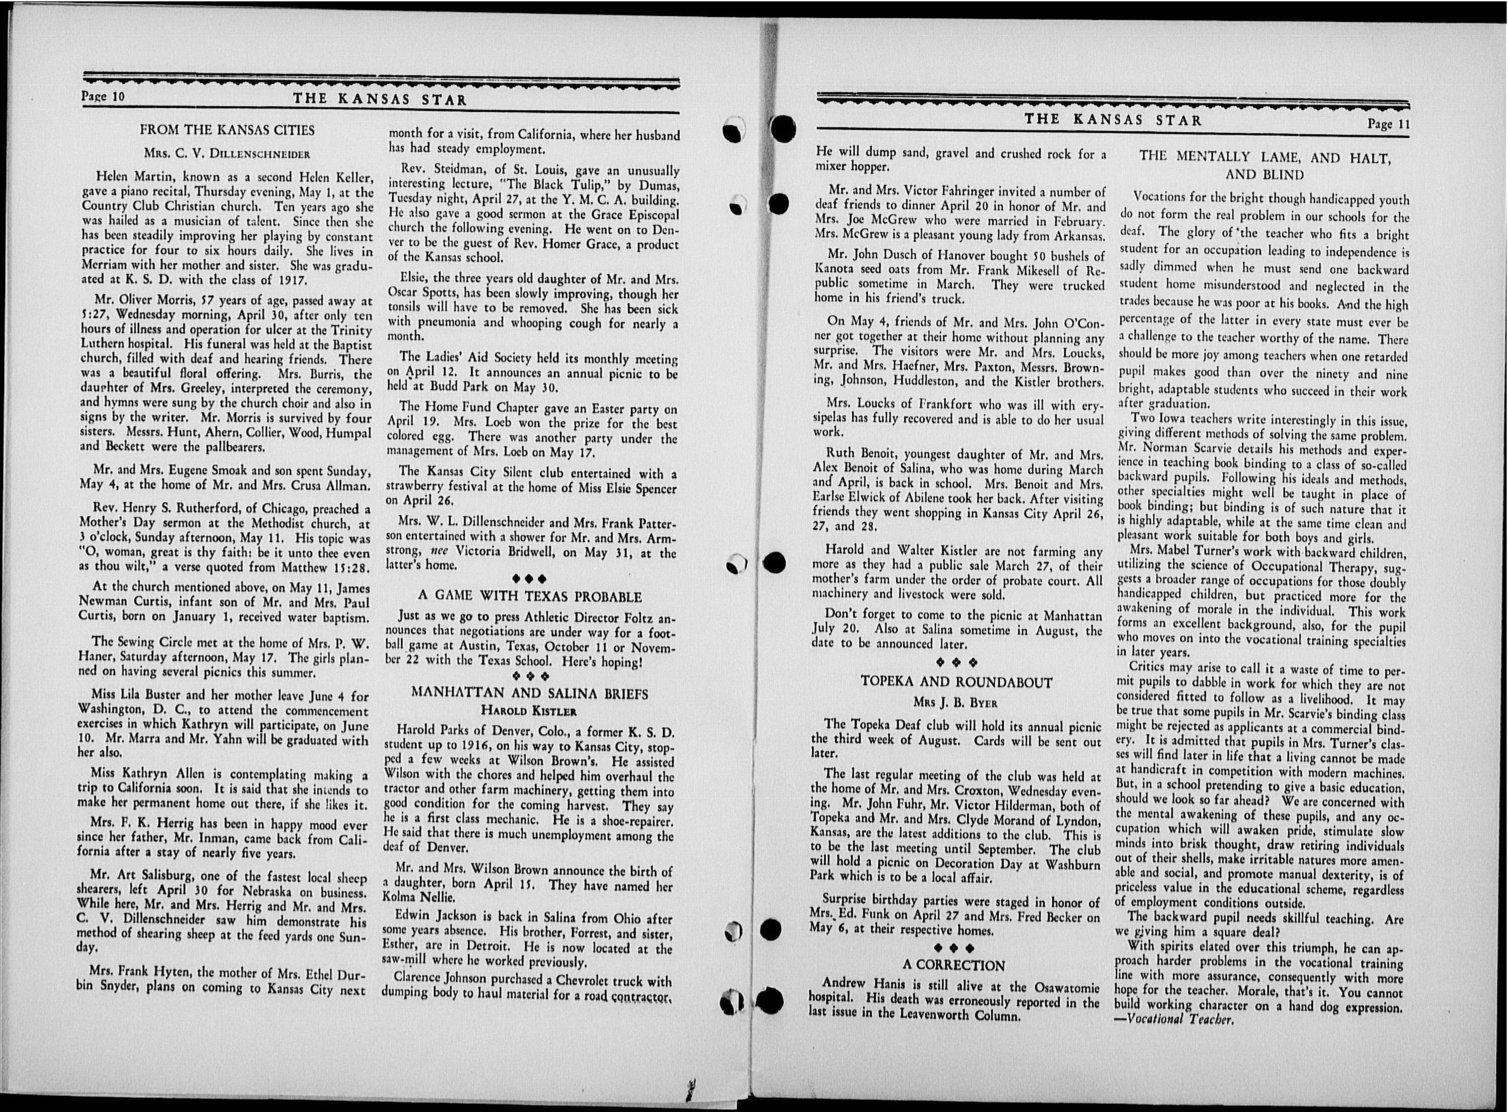 The Kansas Star, volume 53, number 9 - 10-11